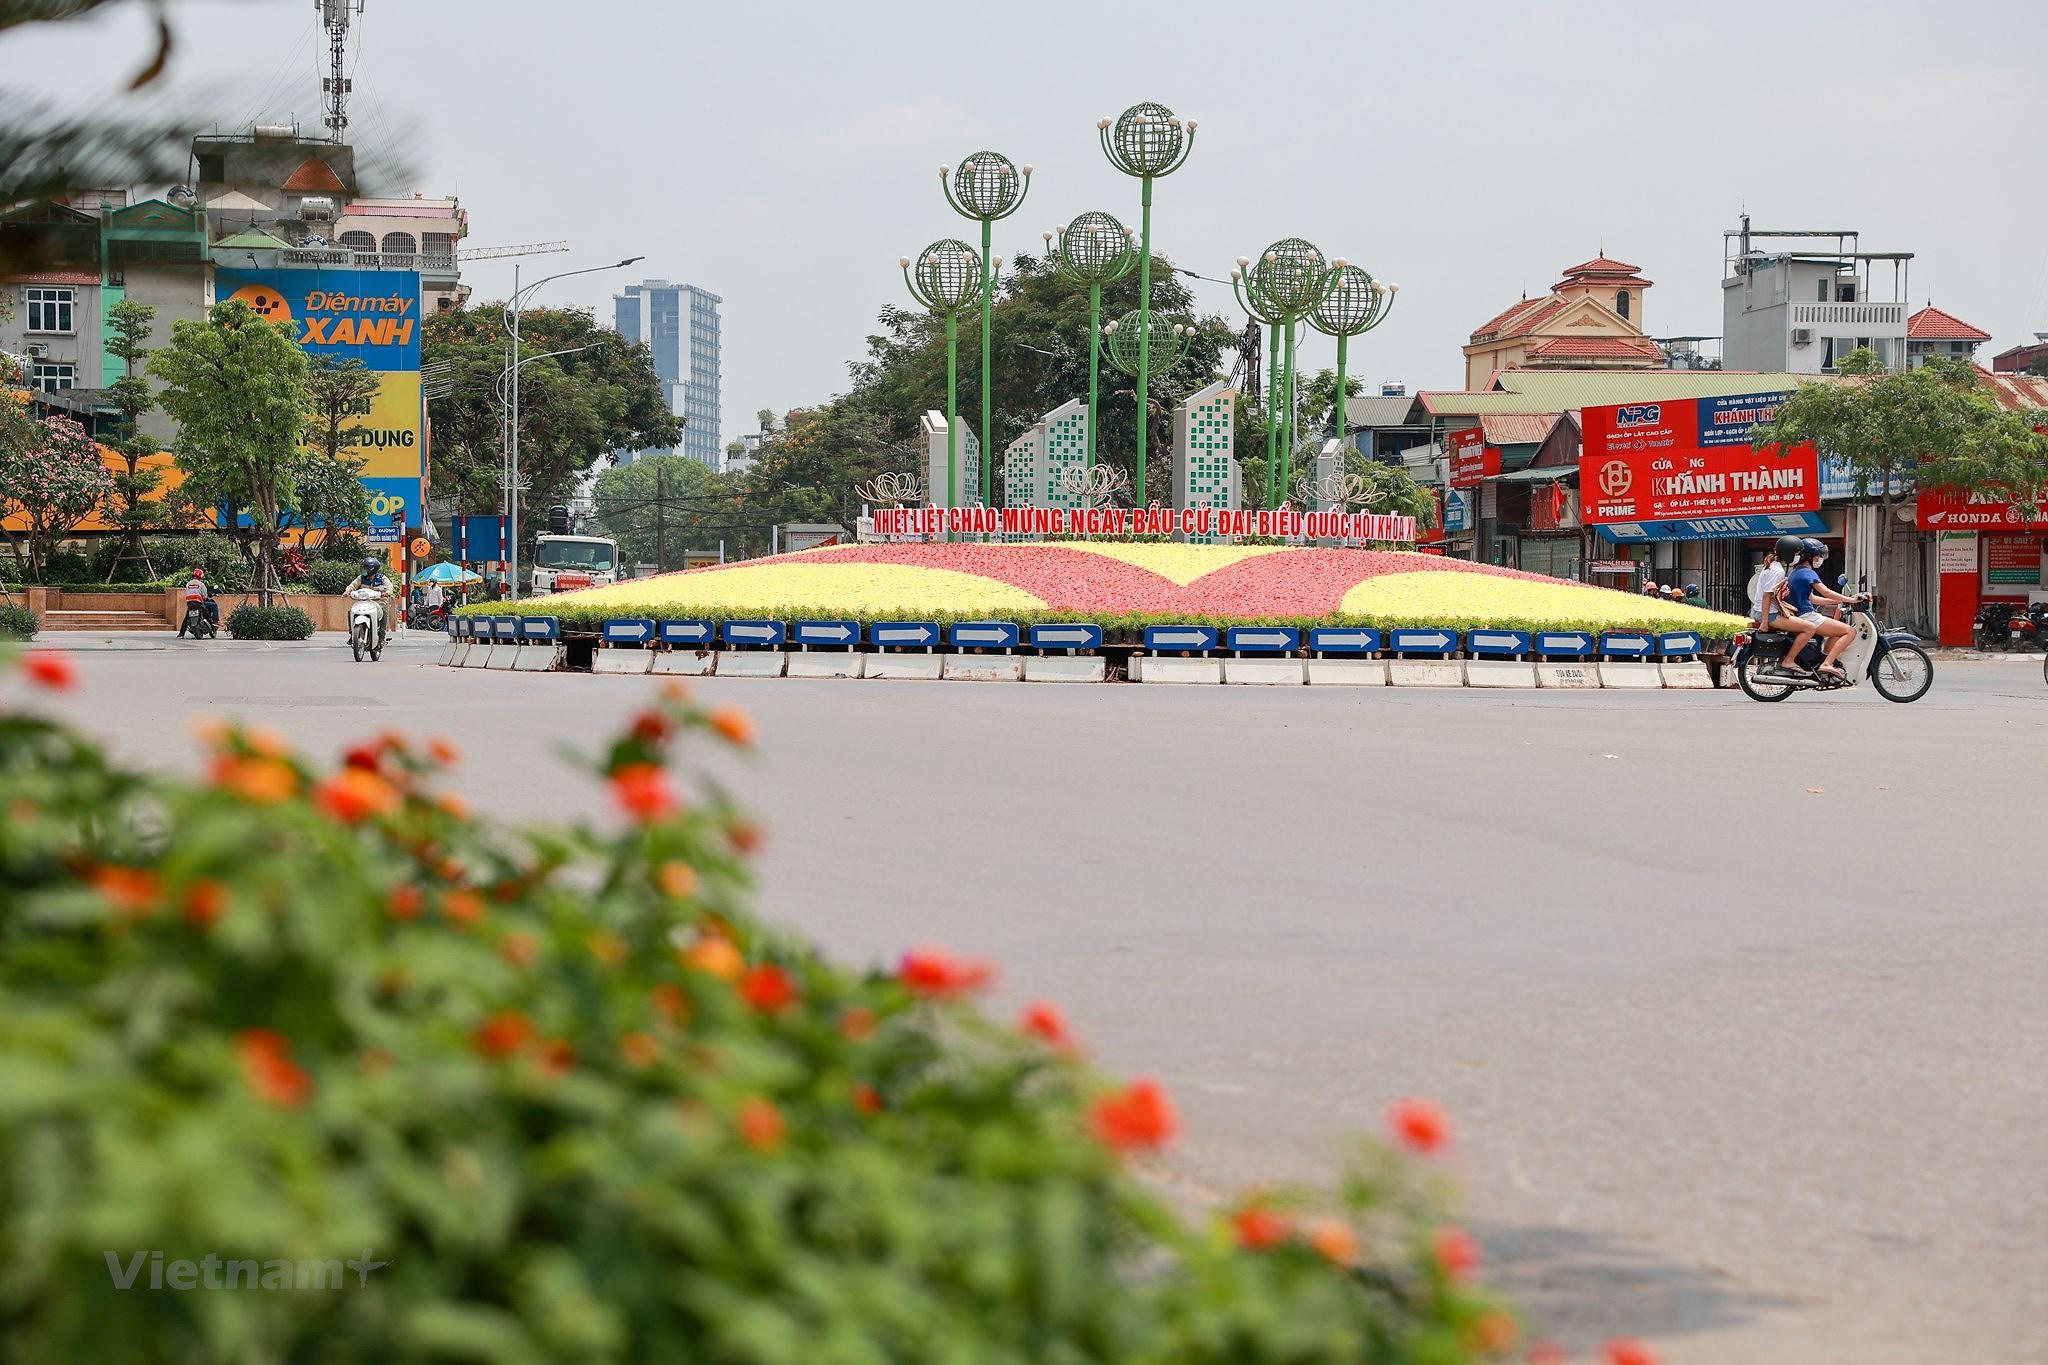 Pho phuong Ha Noi ruc ro co hoa chao don ngay hoi trong dai toan quoc hinh anh 2